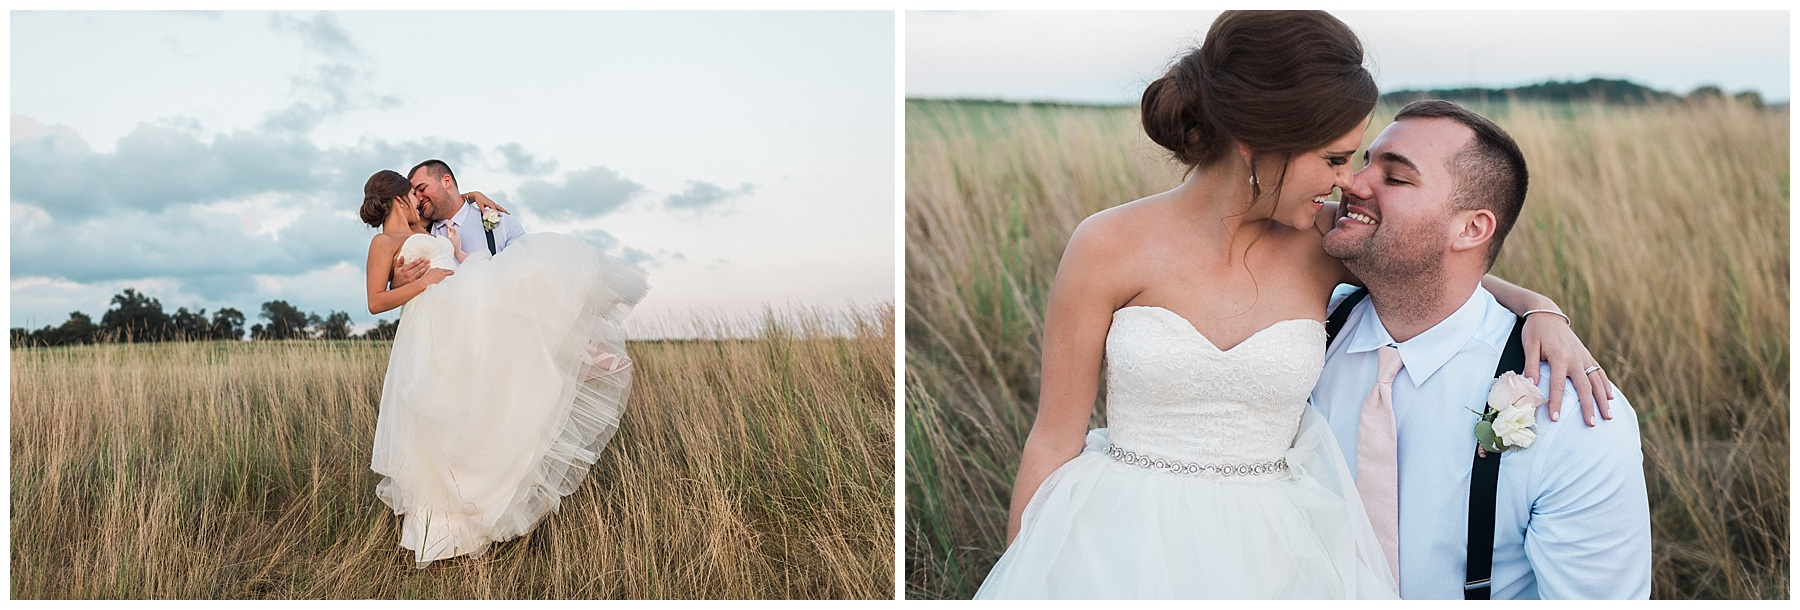 The Links at Firestone Wedding_ Columbiana Ohio_LAR Weddings